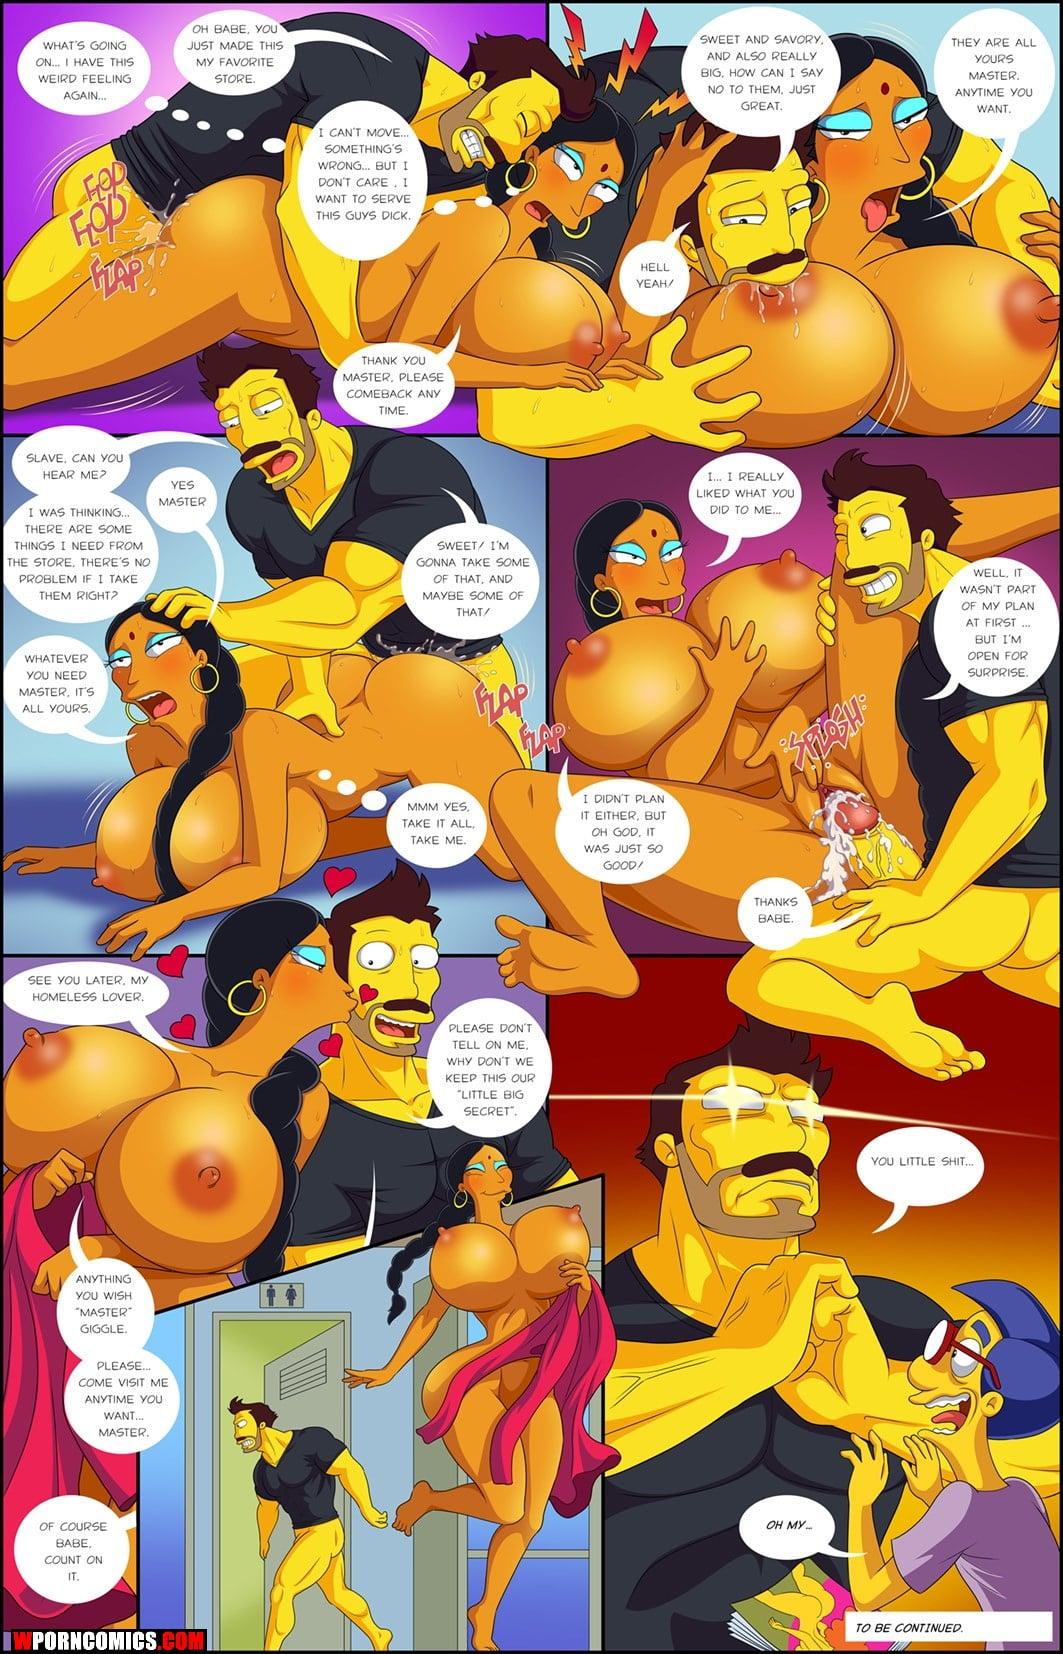 porn-comic-simpsons-darrens-adventure-part-2-2020-03-21/porn-comic-simpsons-darrens-adventure-part-2-2020-03-21-40492.jpg